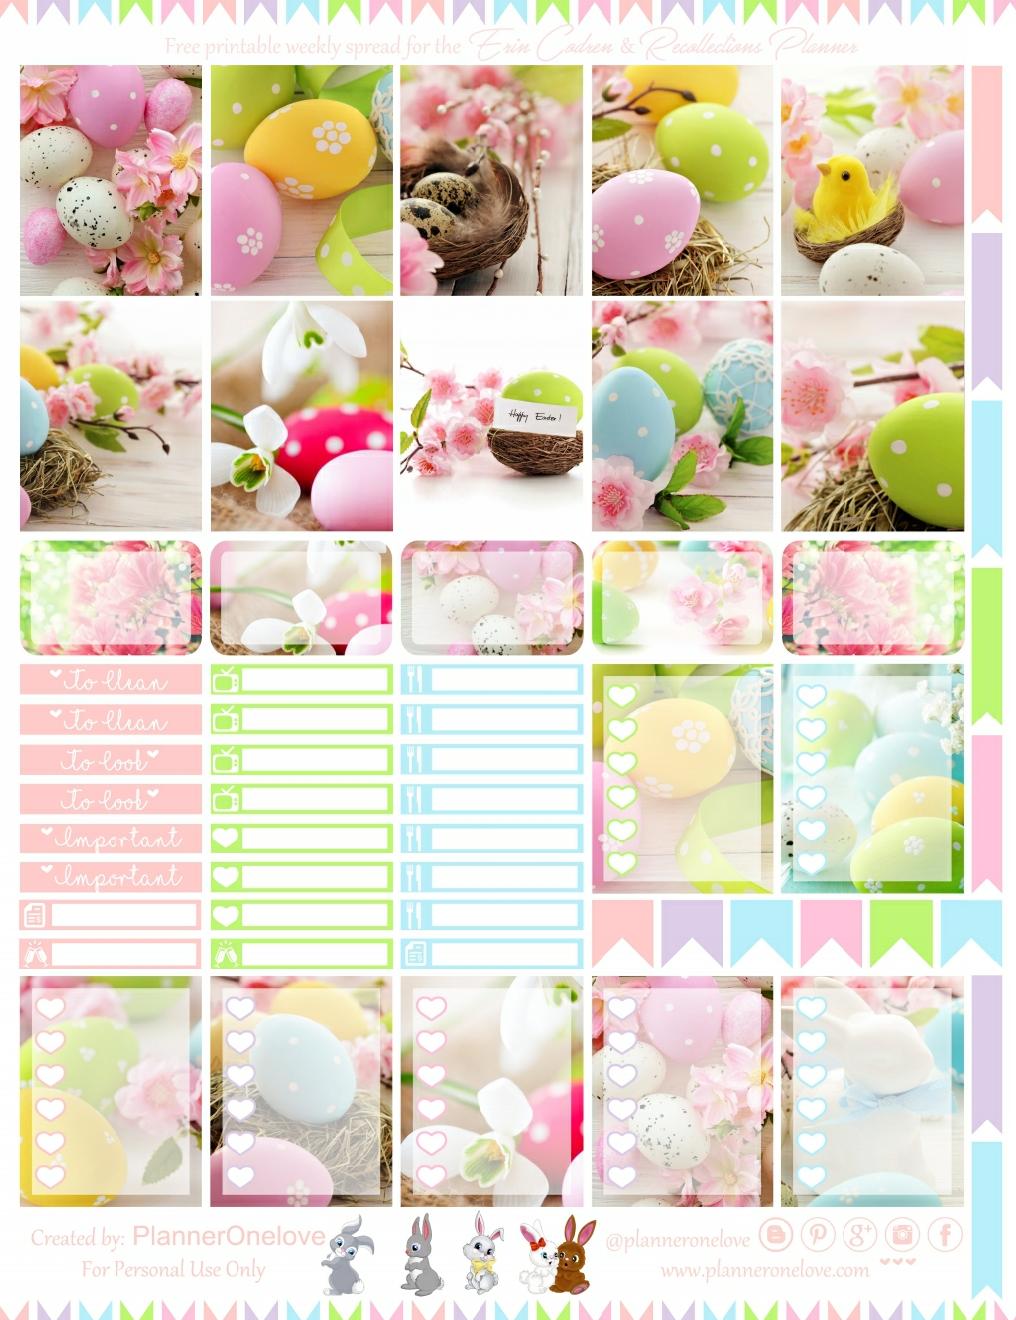 S314- Easter Easter Eggs Happy Easter:Planner Stickers Erin Condren Rabbit